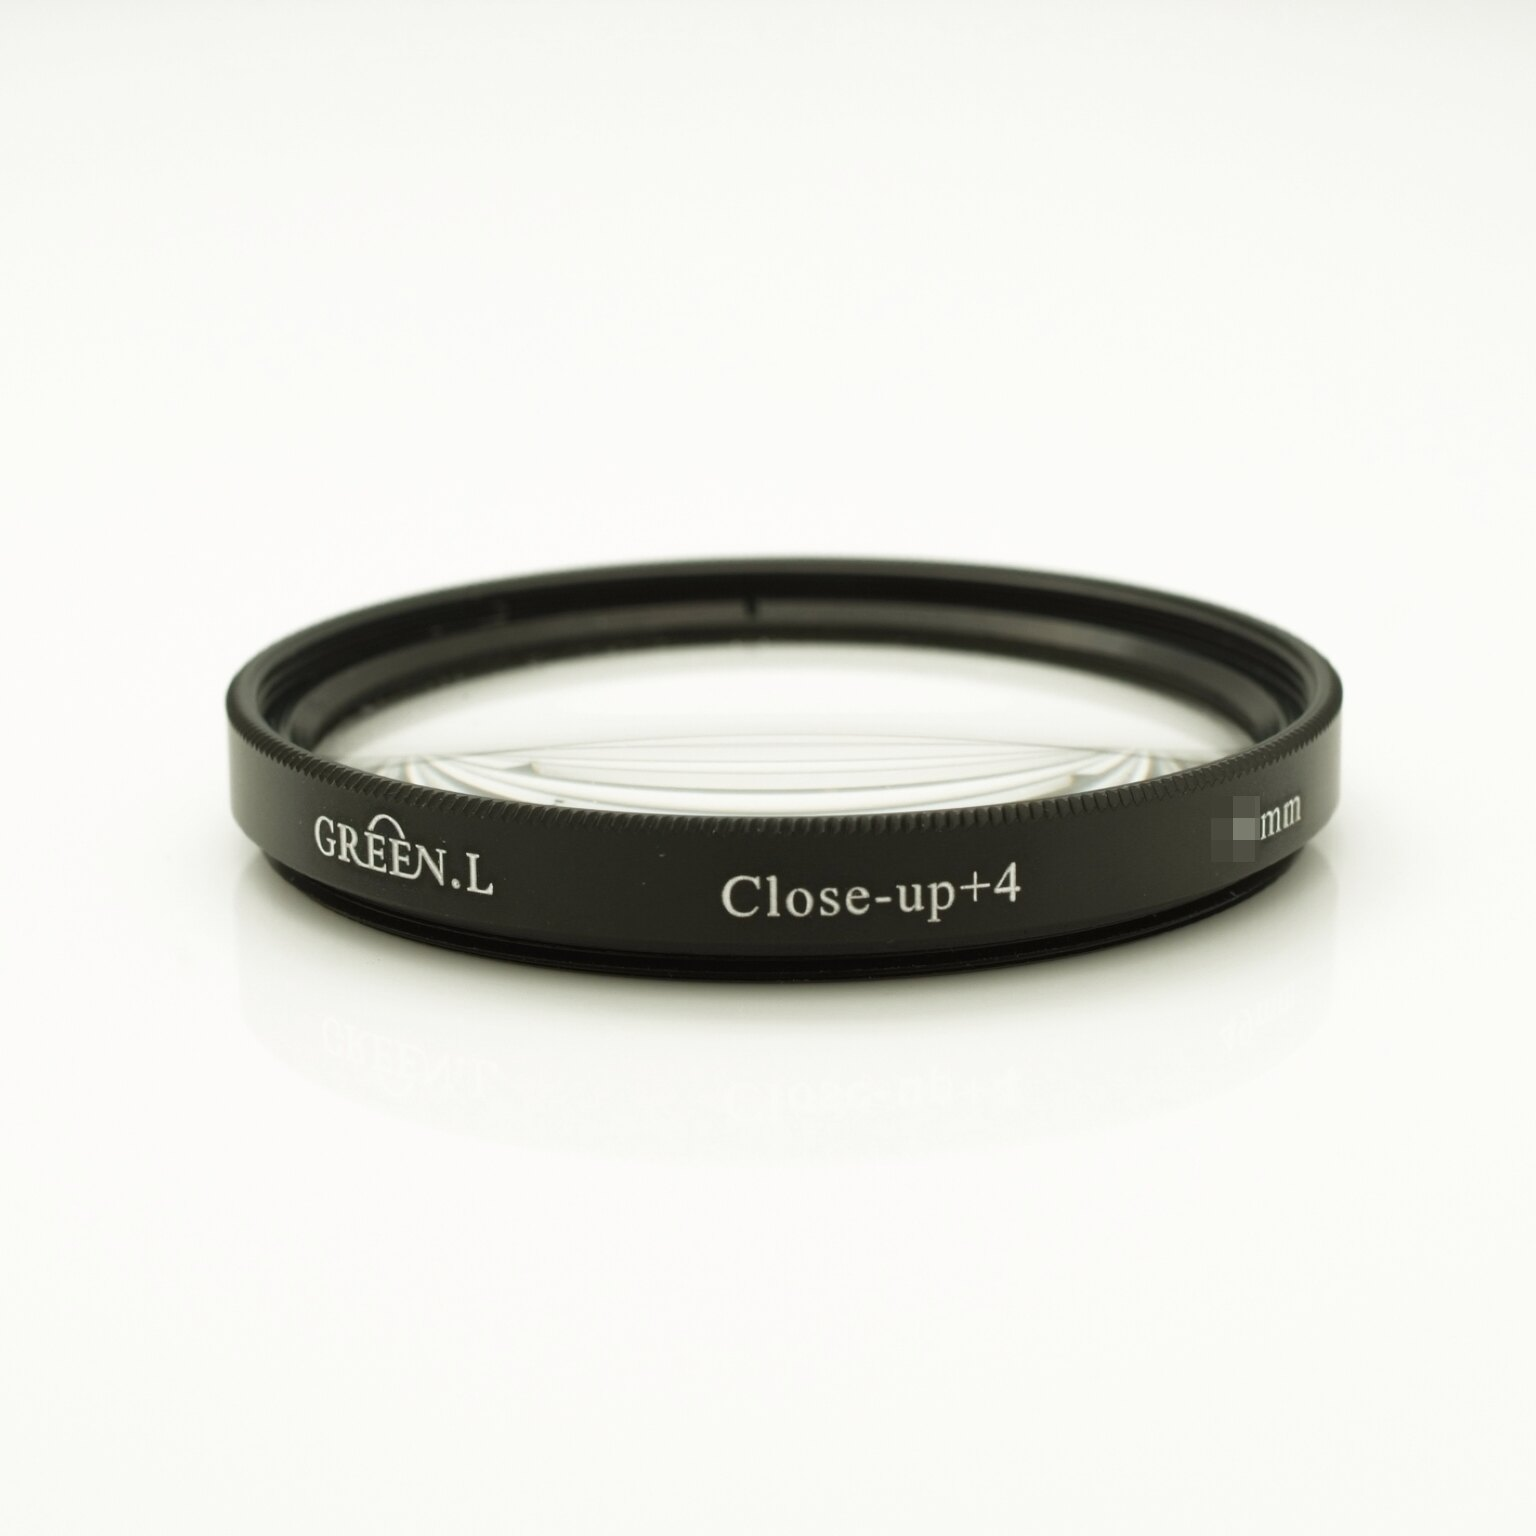 又敗家@ Green.L 58mm近攝鏡(close-up+4)Micro Macro鏡微距鏡,代倒接環雙陽環適近拍生態攝影適Canon EF-S 18-55mm F3.5-5.6 55-250mm f4- IS II USM